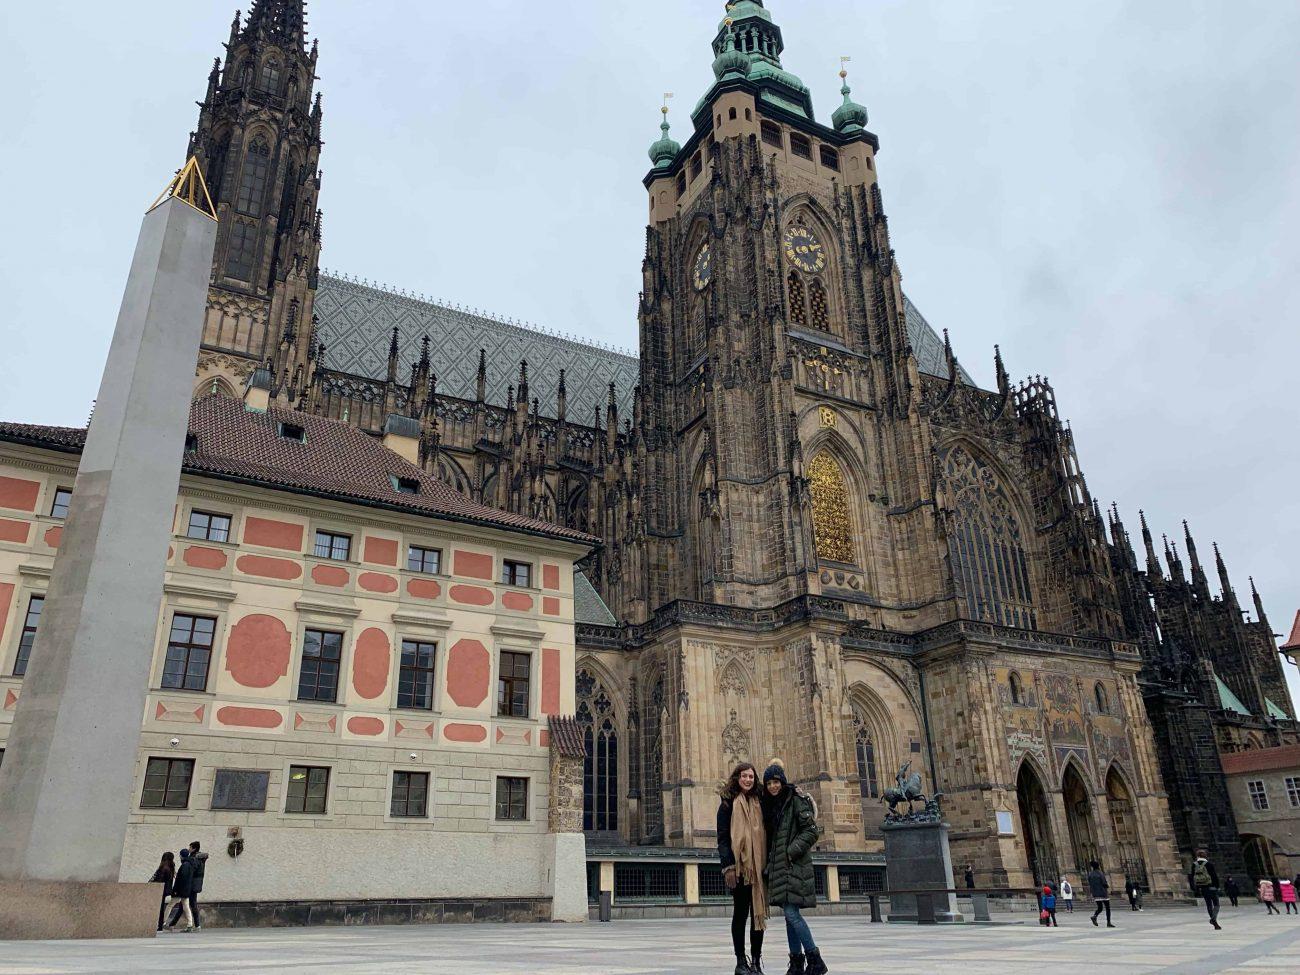 The Prague Cathedral in Prague, Czech Republic